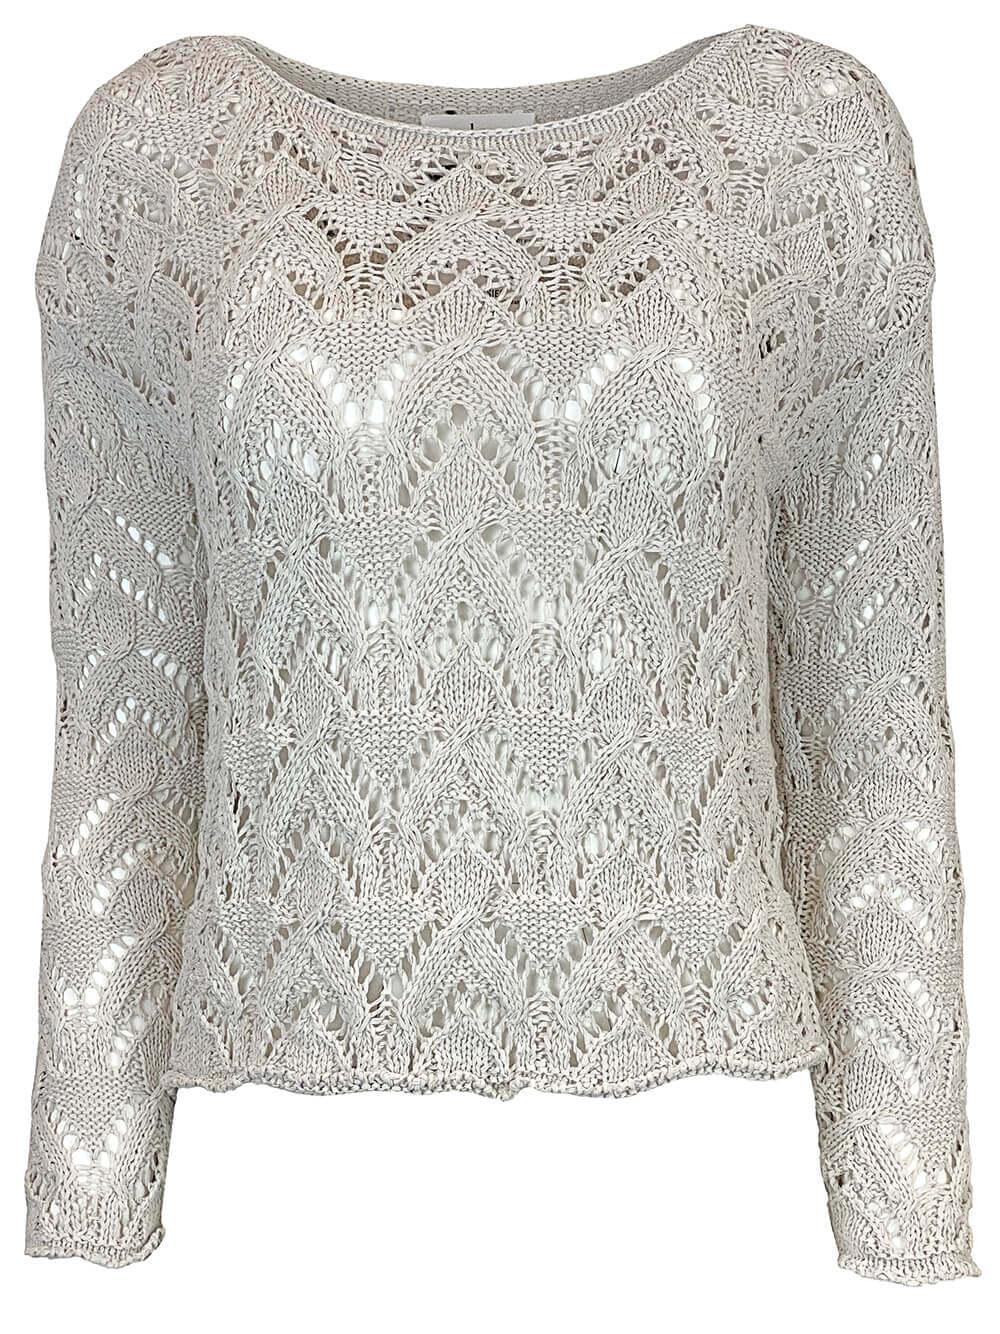 Cotton Open Crochet Sweater Item # NITS04